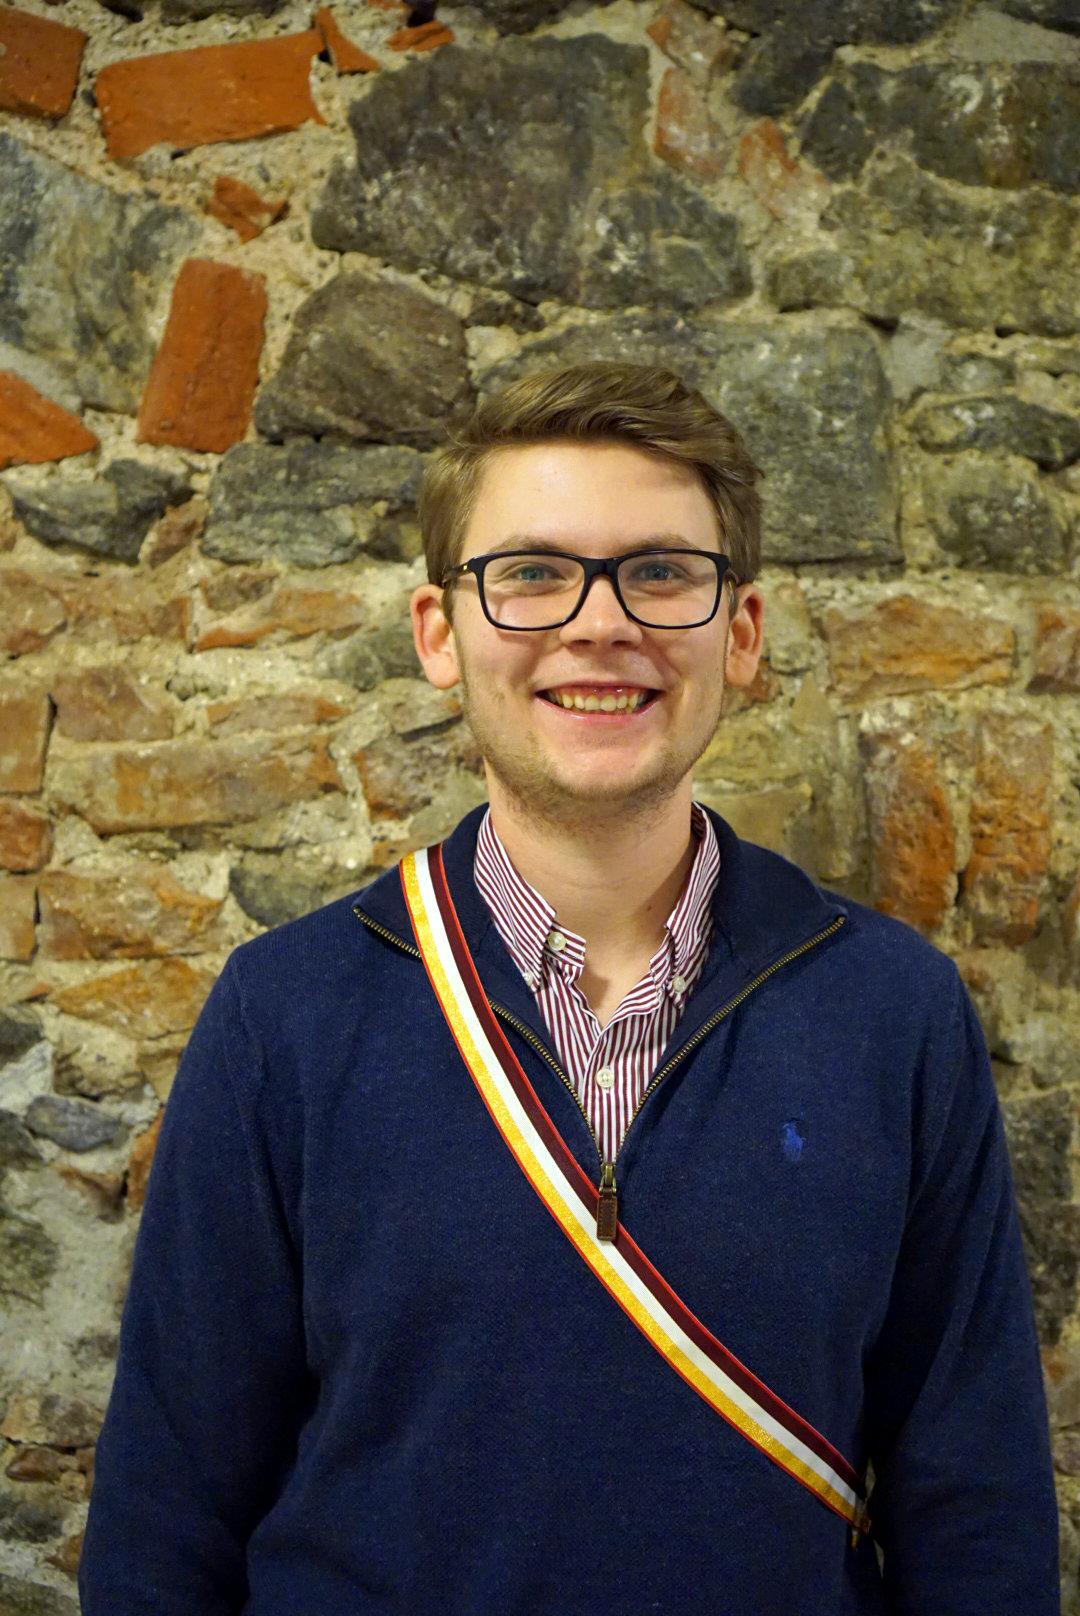 DK Bastian Donabauer